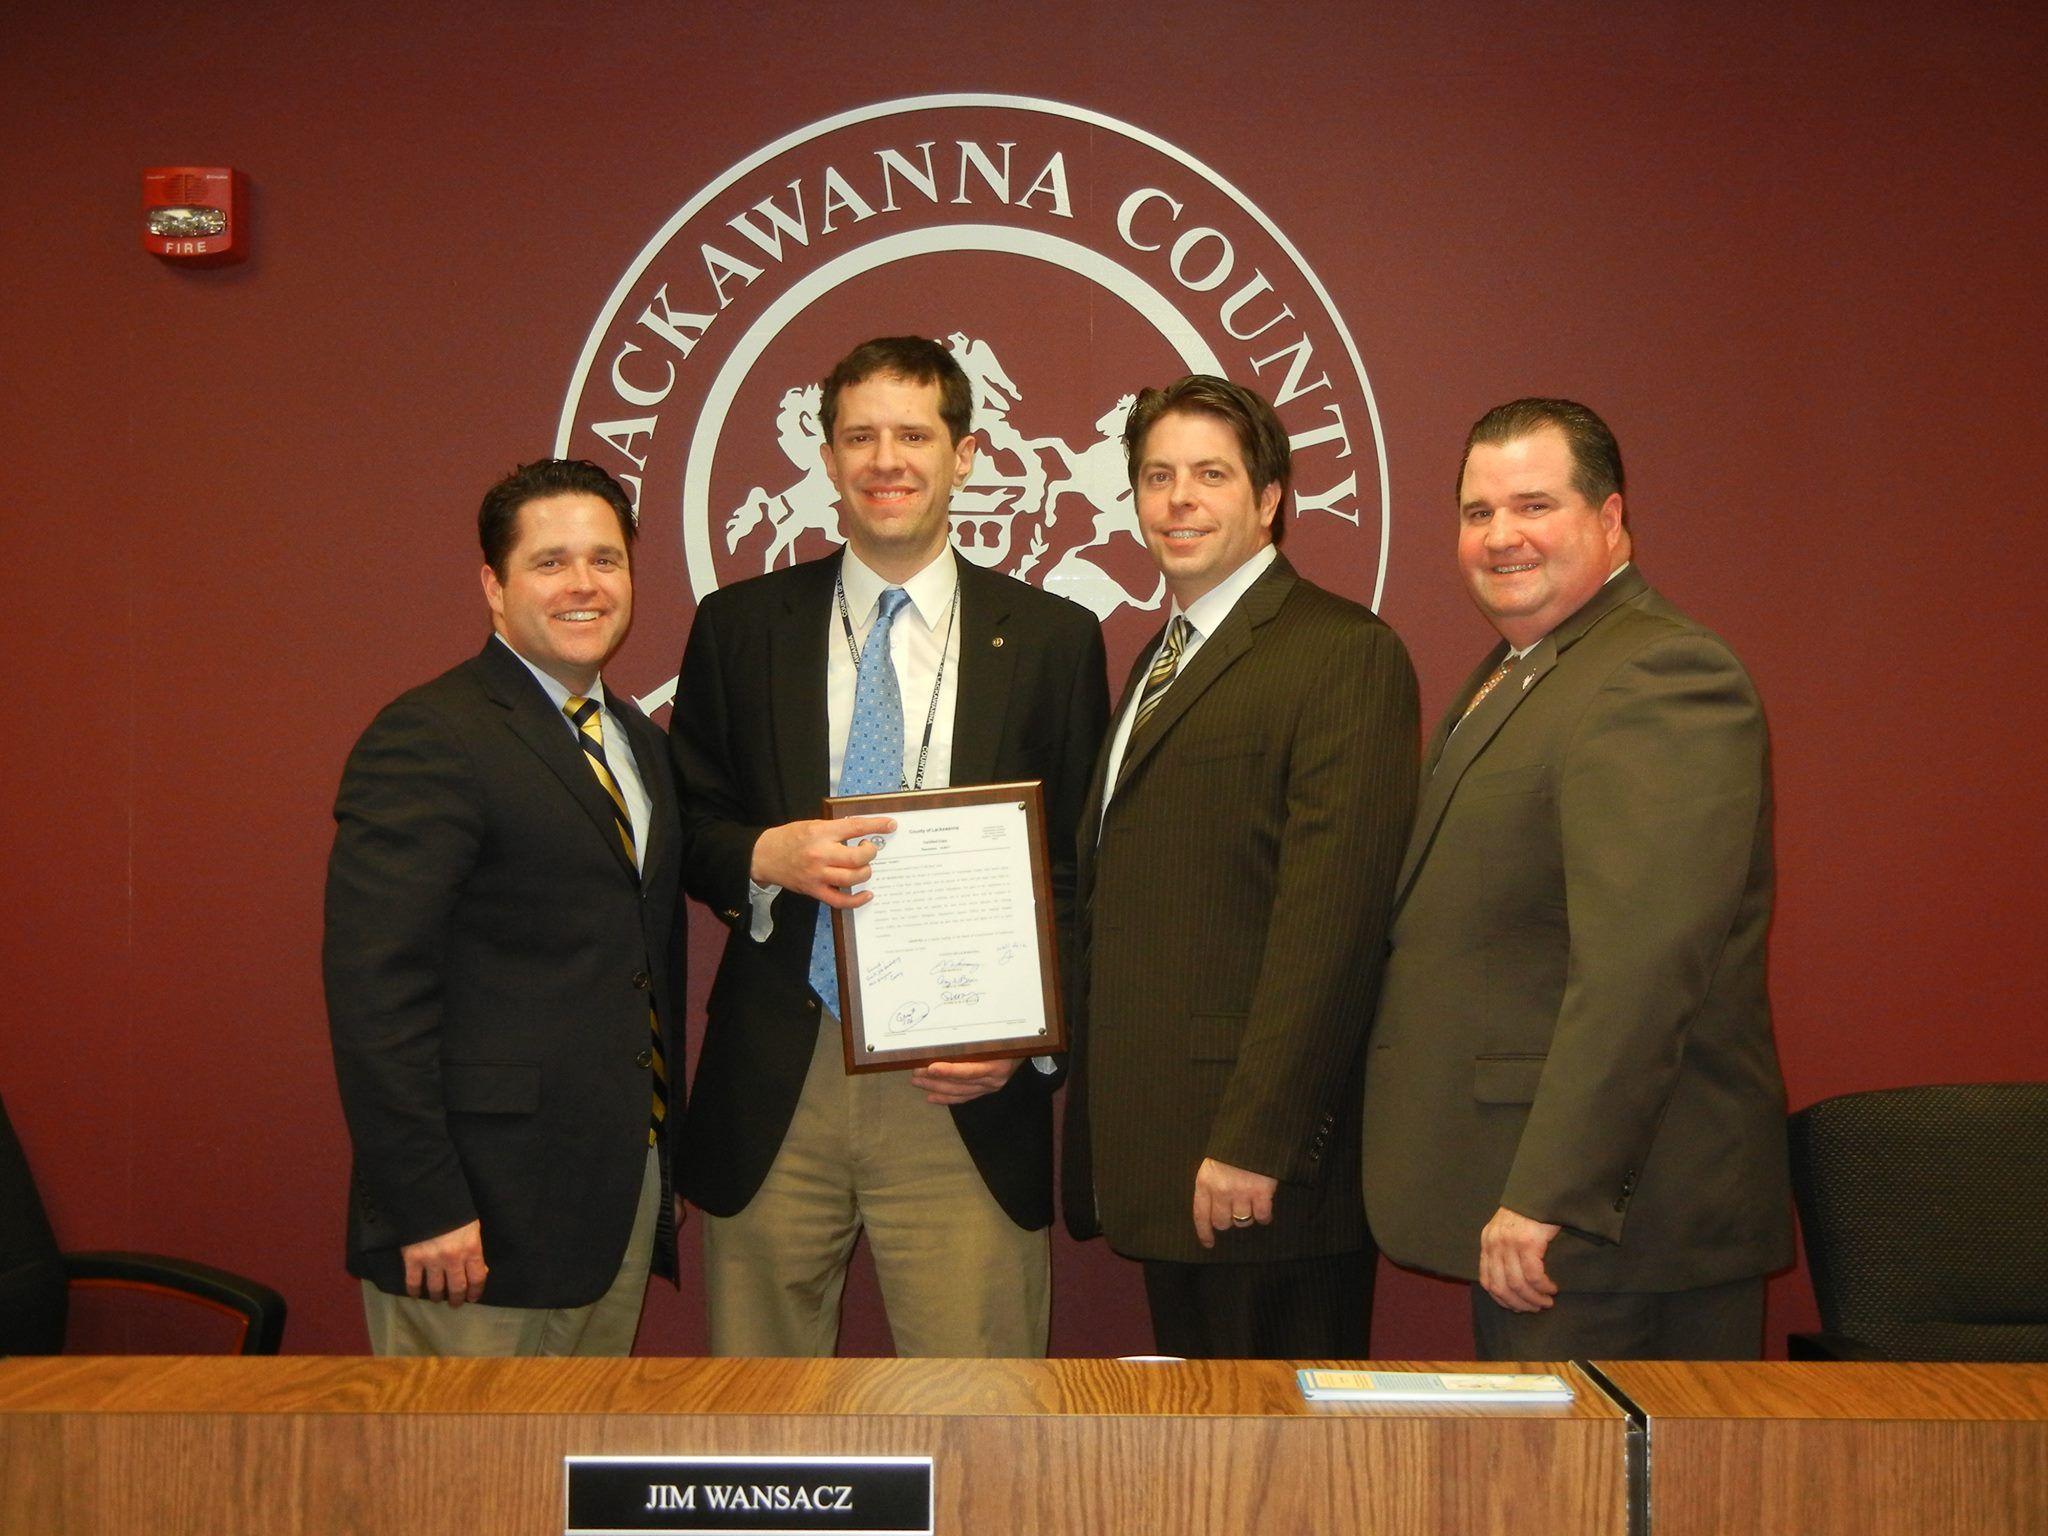 The Lackawanna County Commissioners present Gerard Hetman